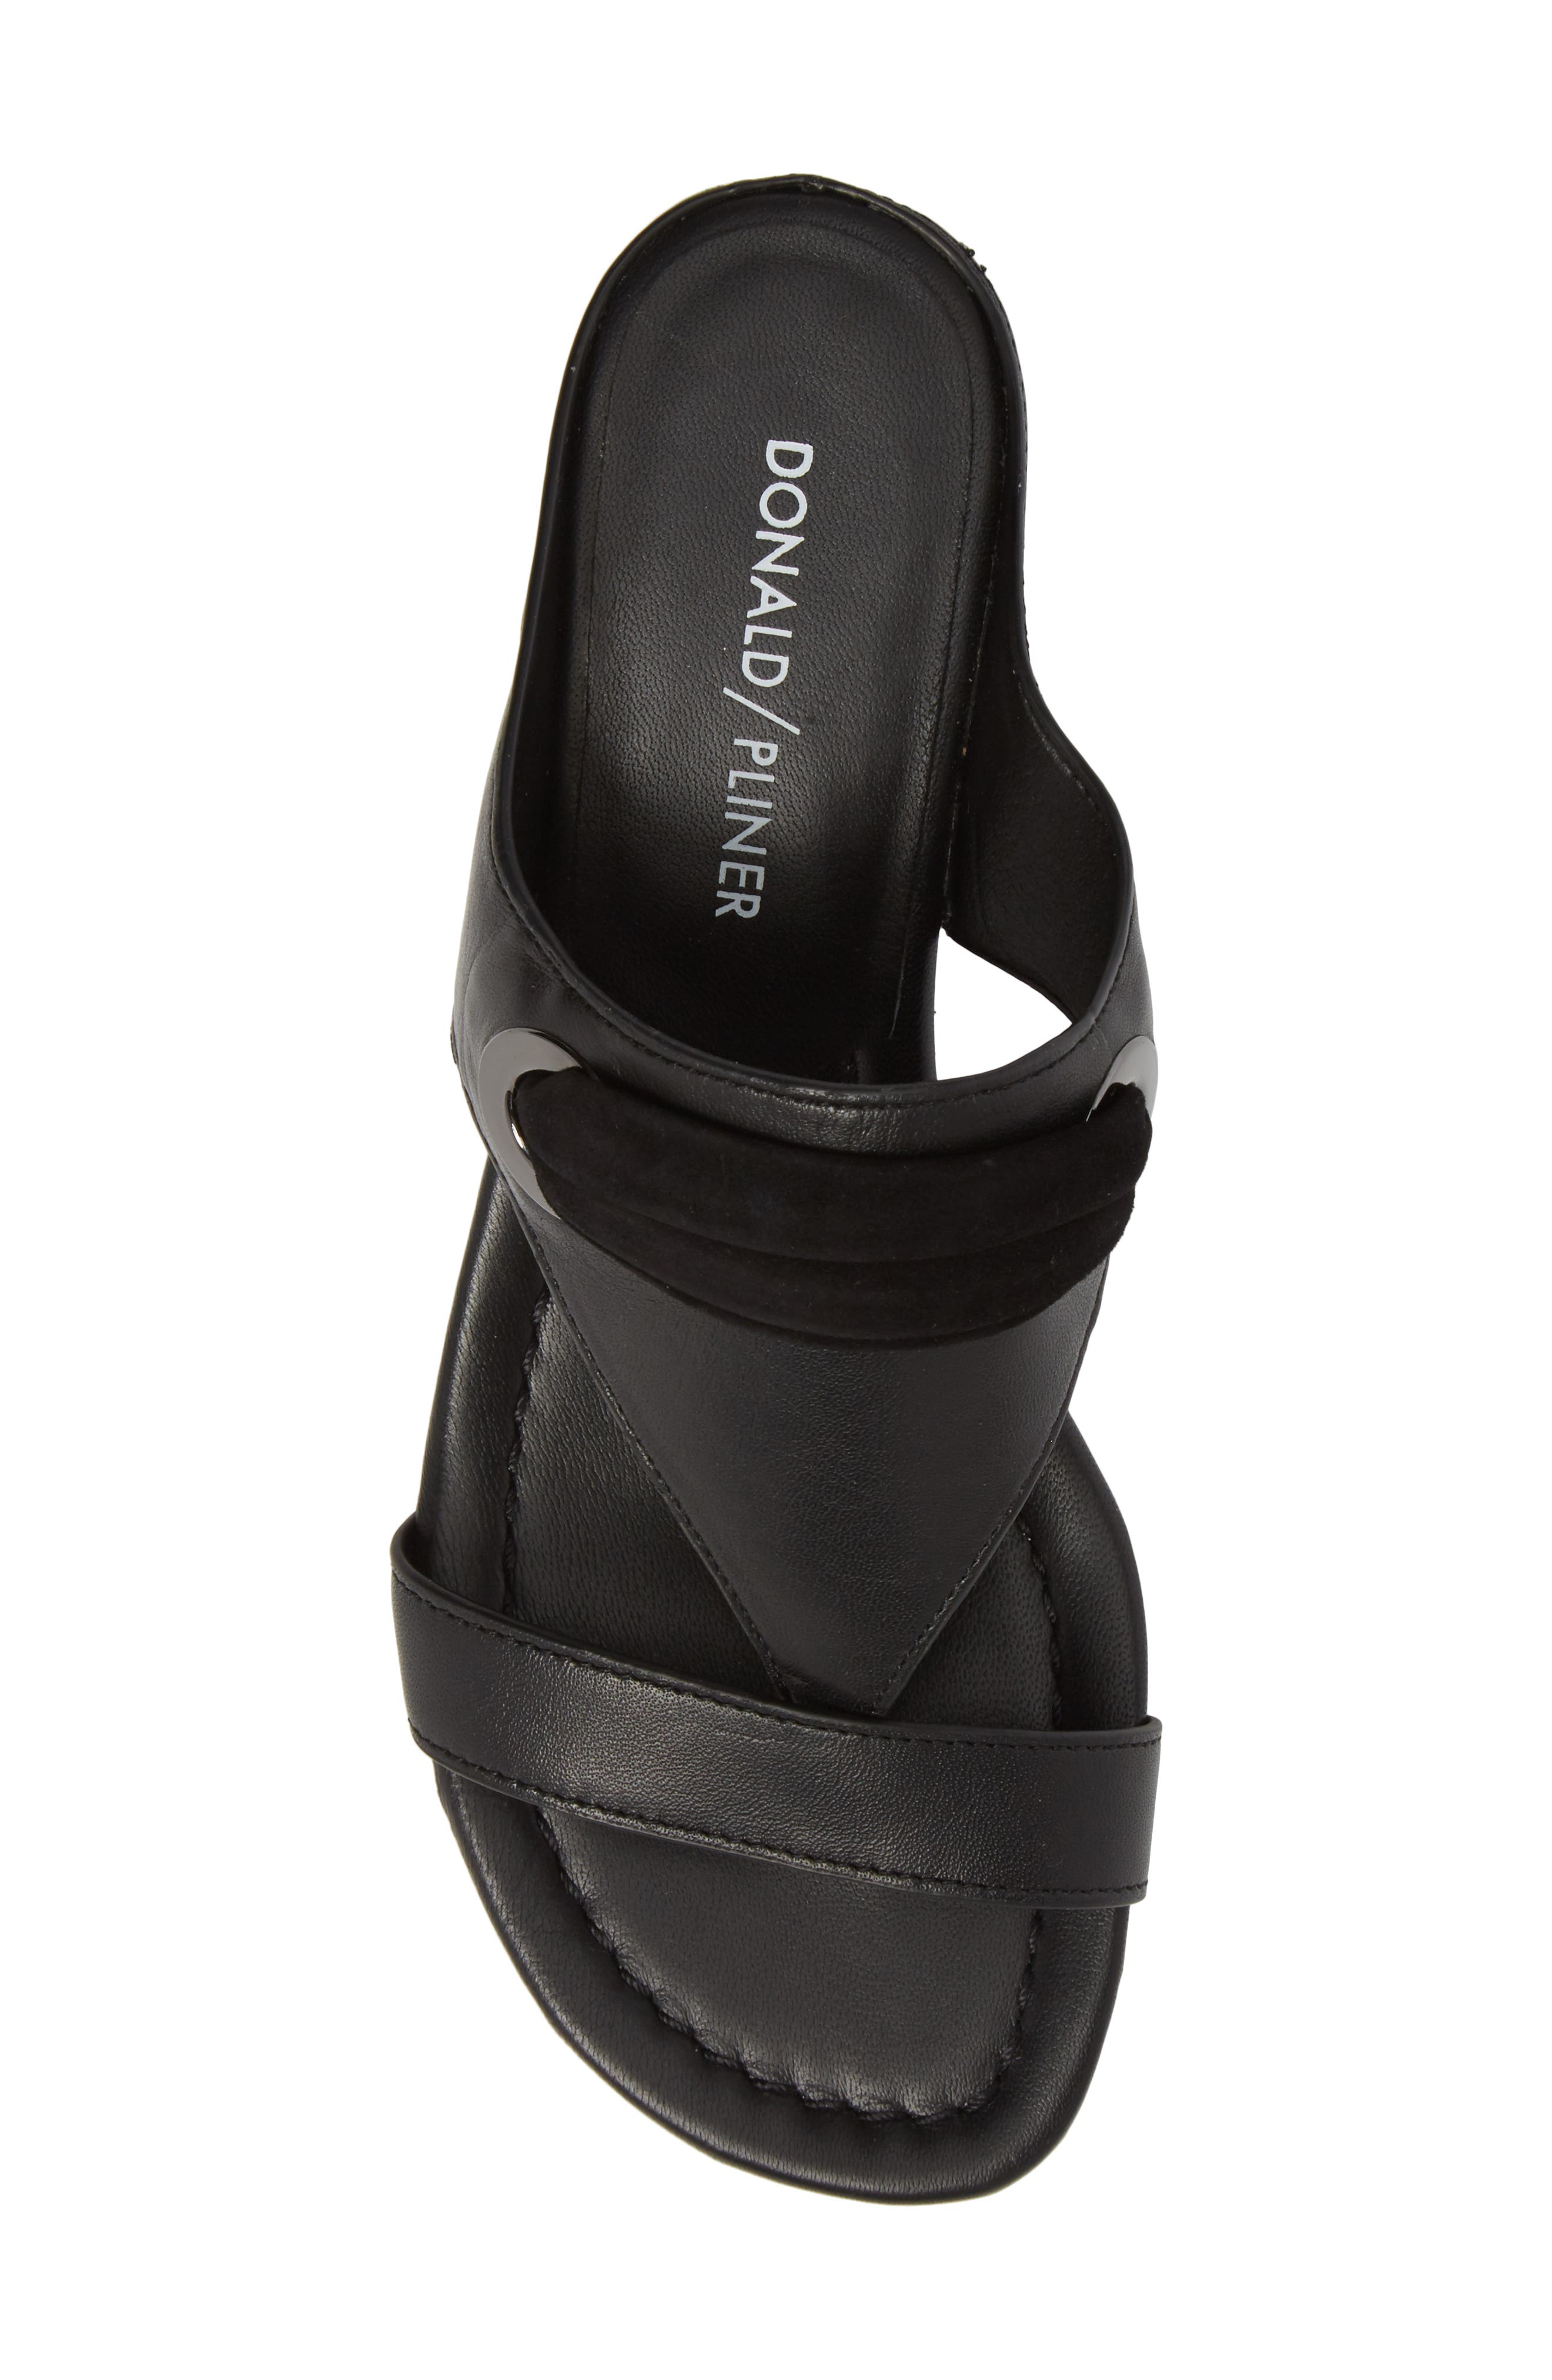 Dionne Wedge Sandal,                             Alternate thumbnail 5, color,                             Black Leather